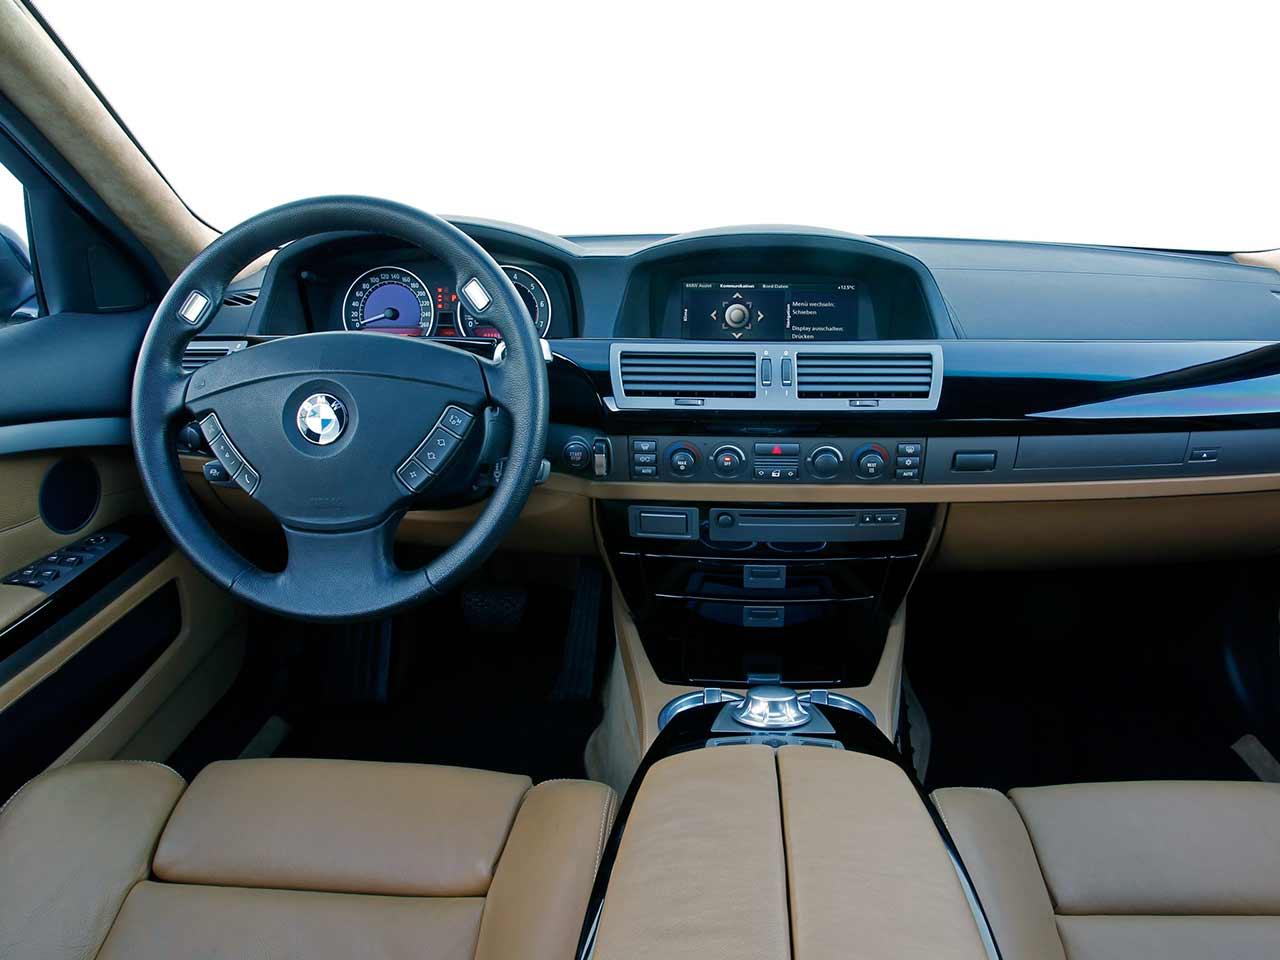 BMW 760Li E66 LWB-version interior LHD